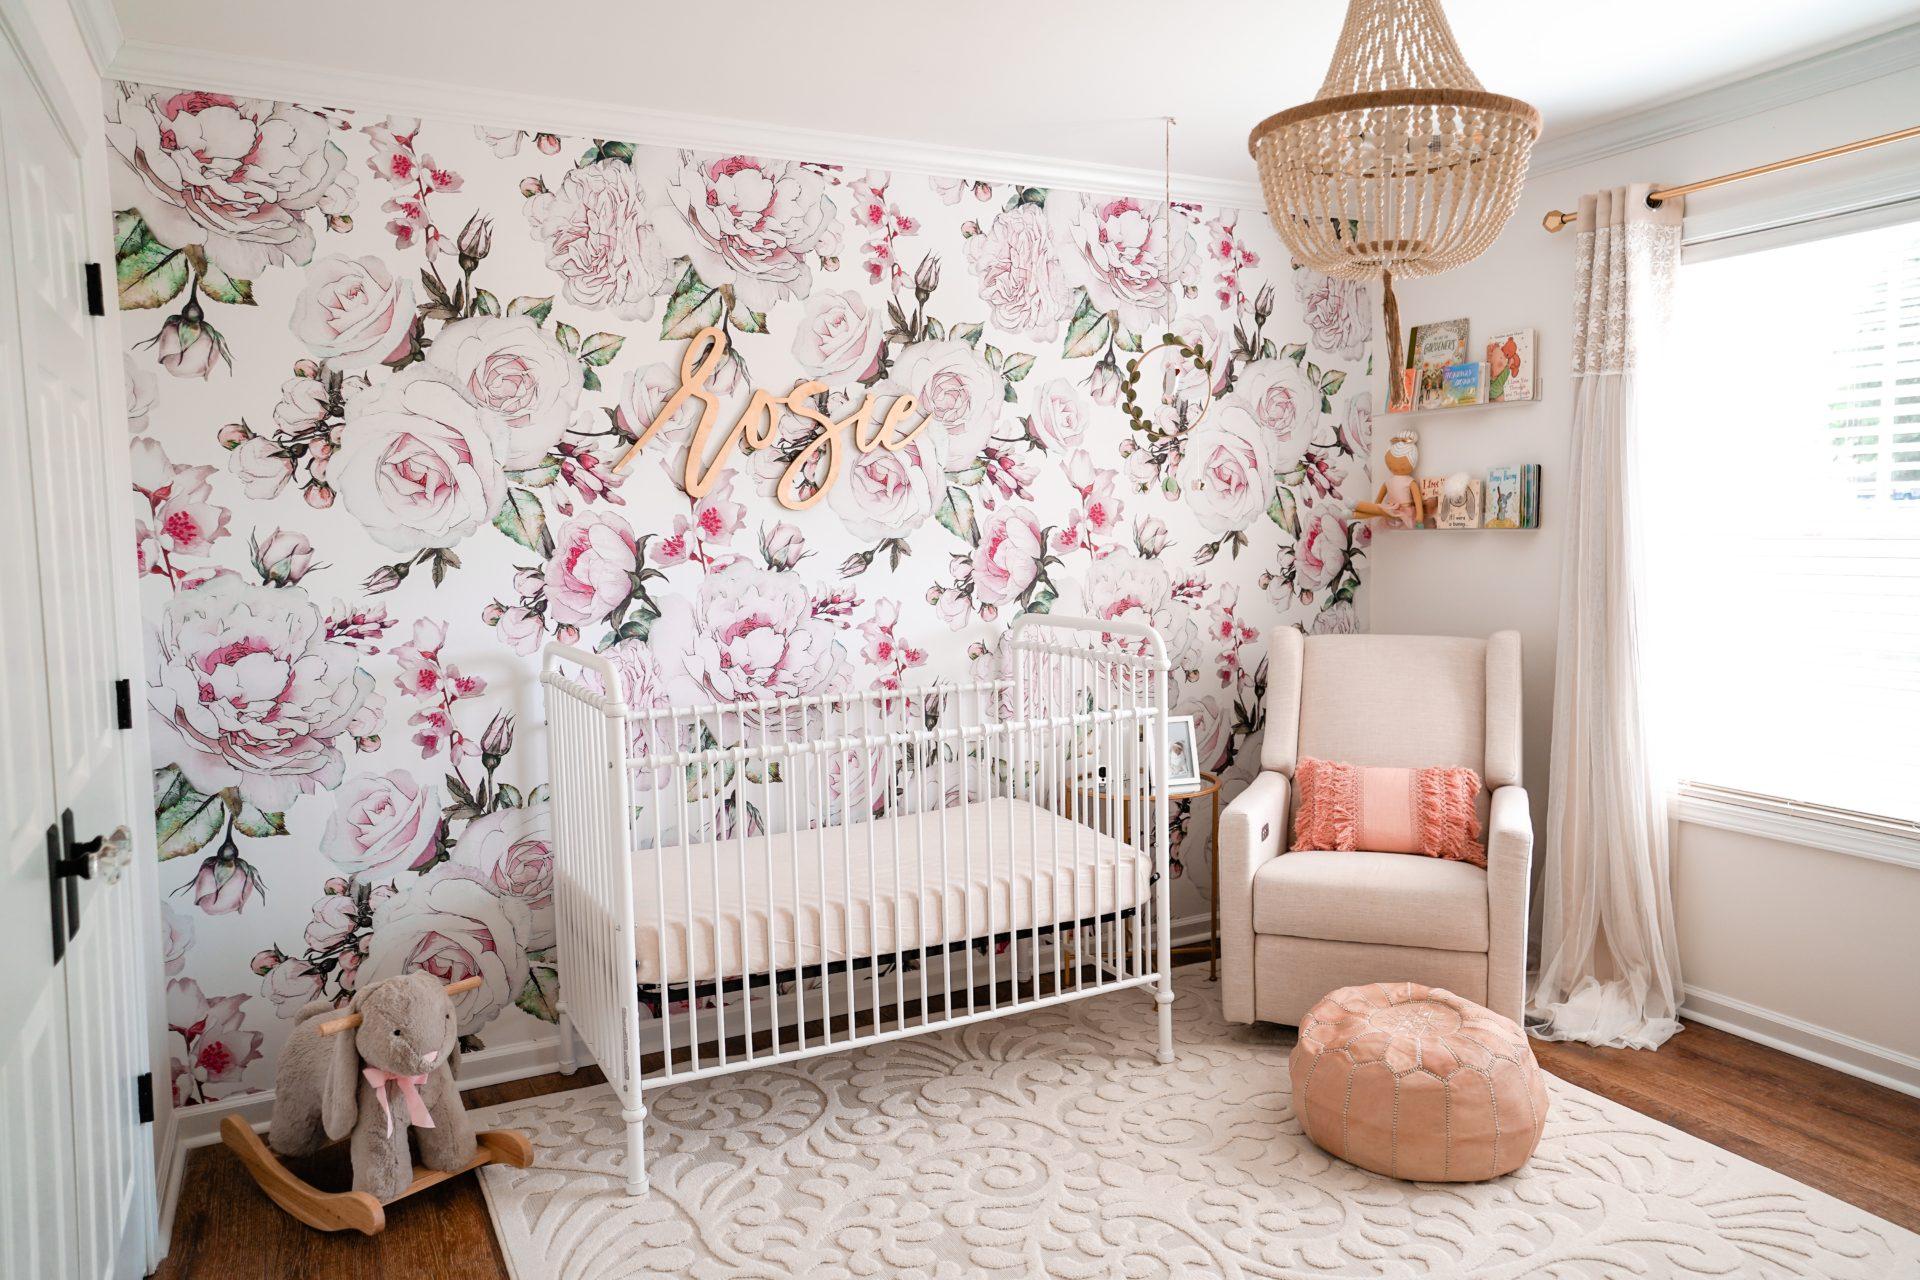 Morgan Bullard's Nursery with Pink Floral Wallpaper